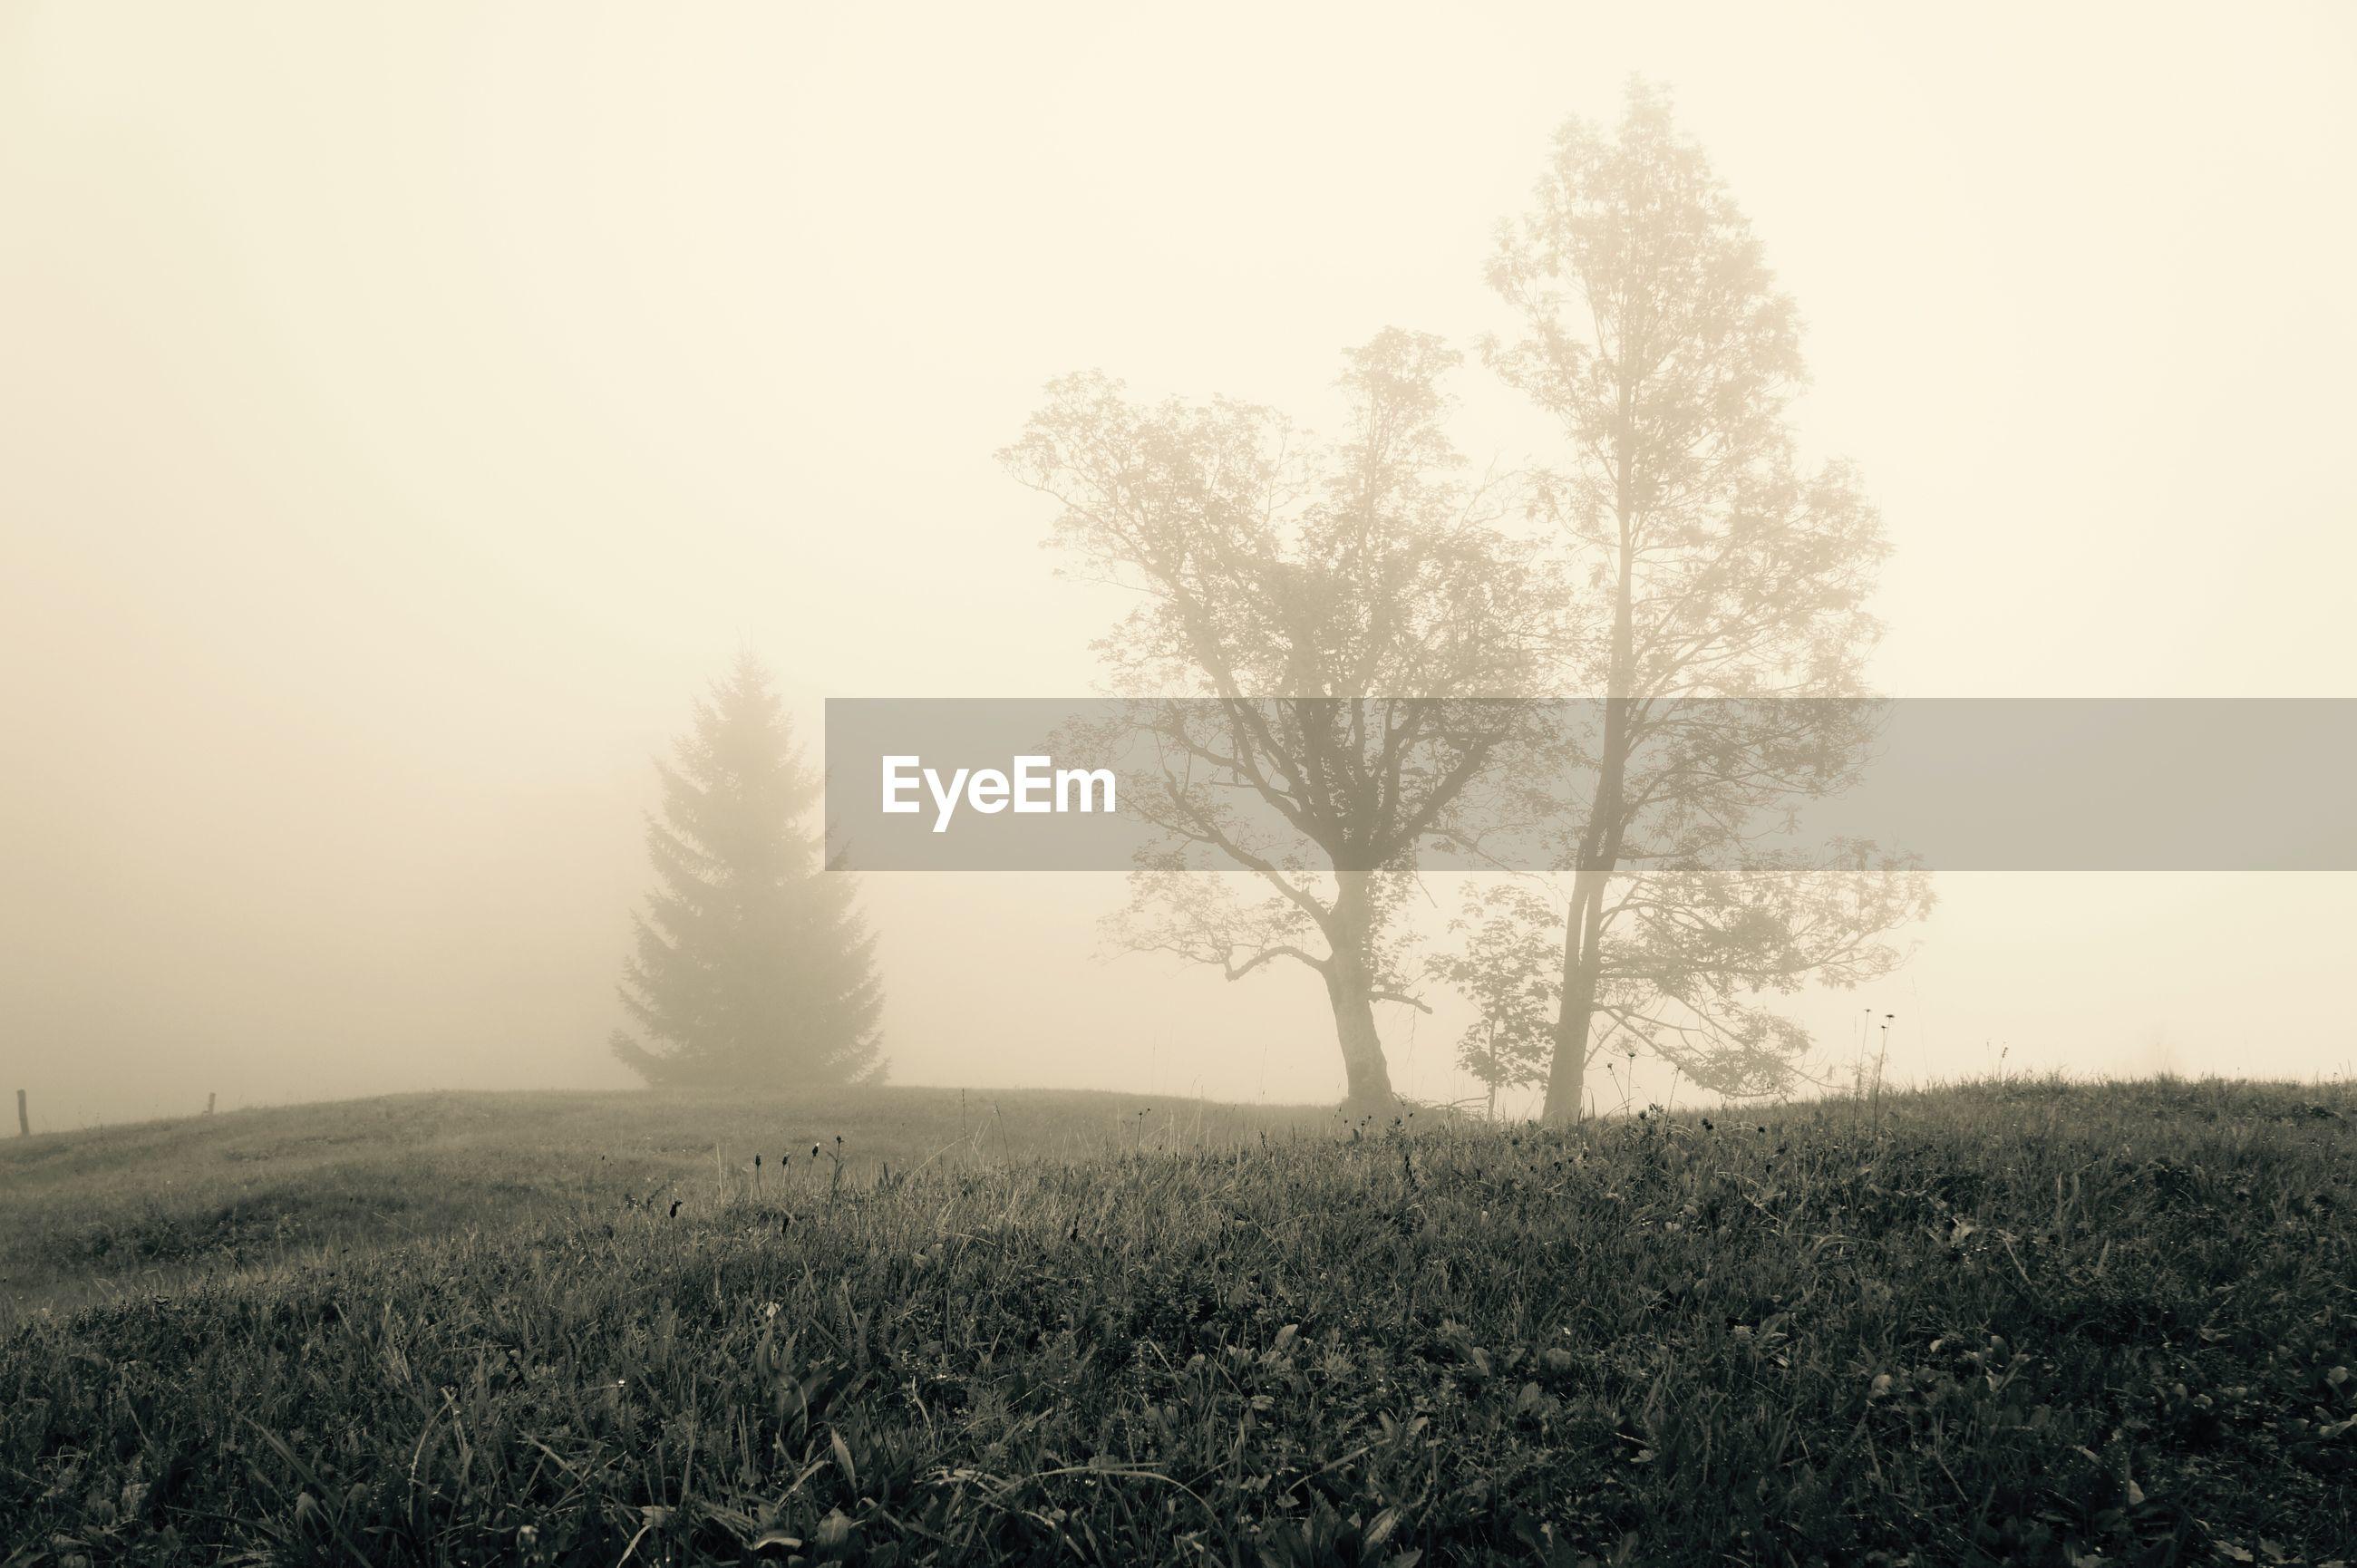 tranquility, tranquil scene, fog, tree, landscape, foggy, field, scenics, copy space, beauty in nature, nature, grass, bare tree, growth, non-urban scene, sky, grassy, solitude, remote